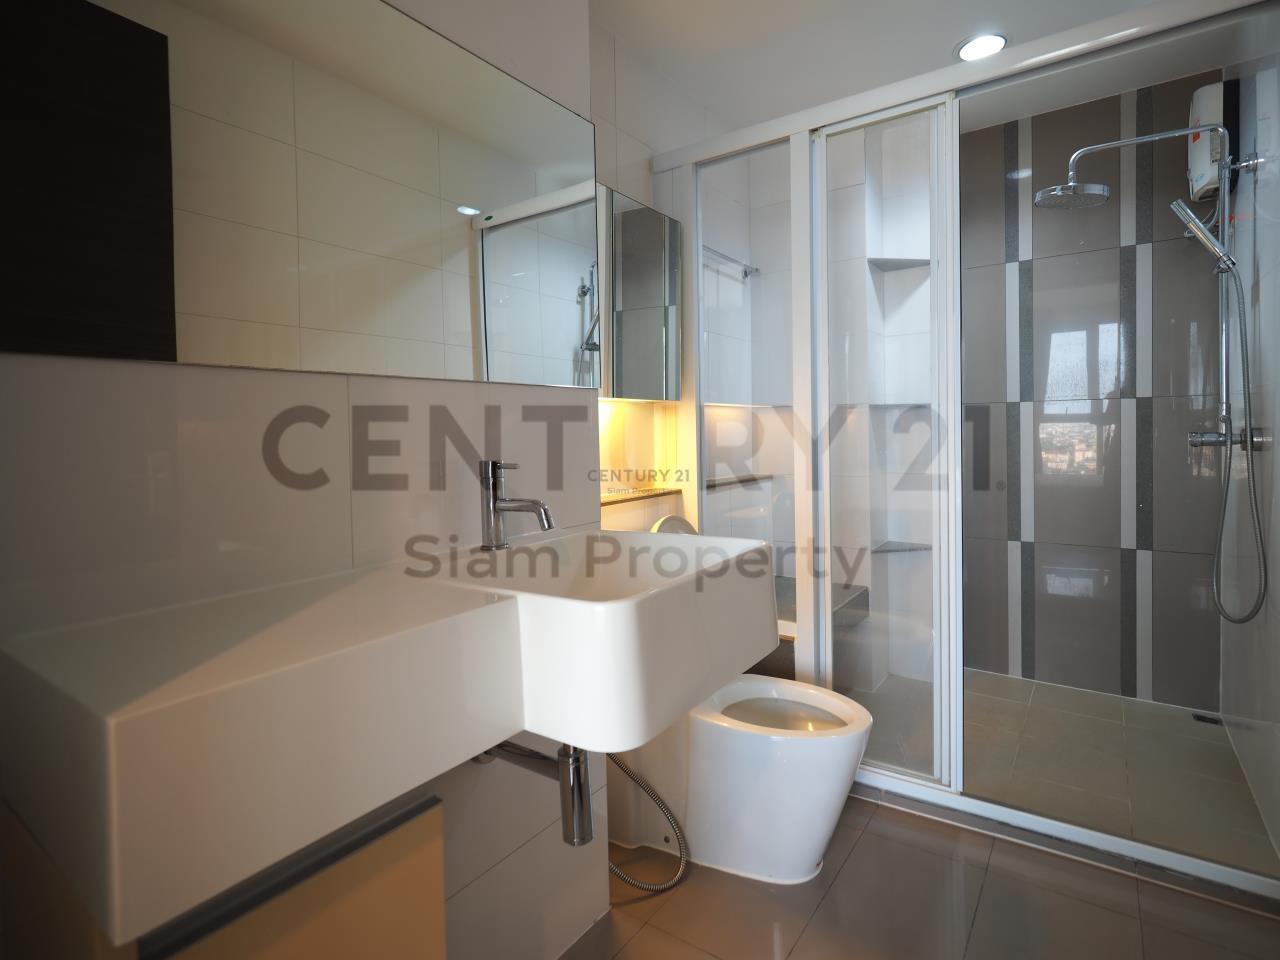 Century21 Siam Property Agency's Rhythm Ratchada 6